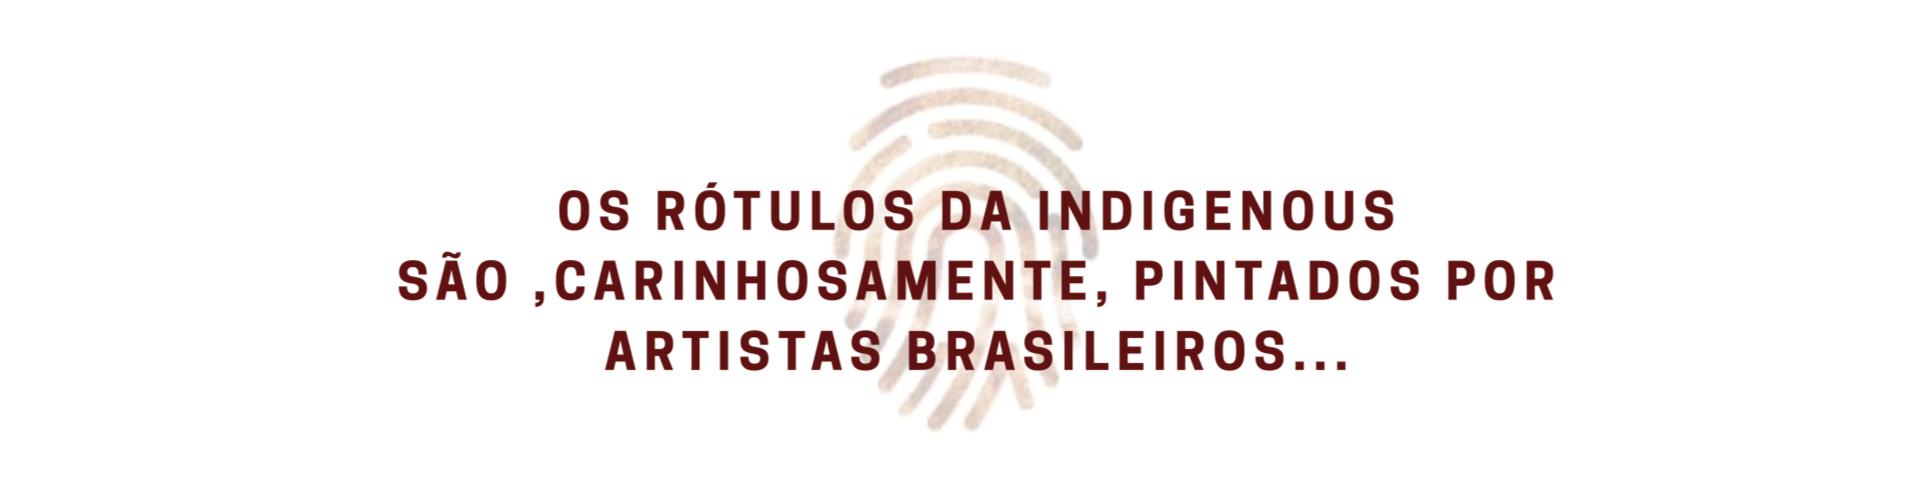 Indigenous 3